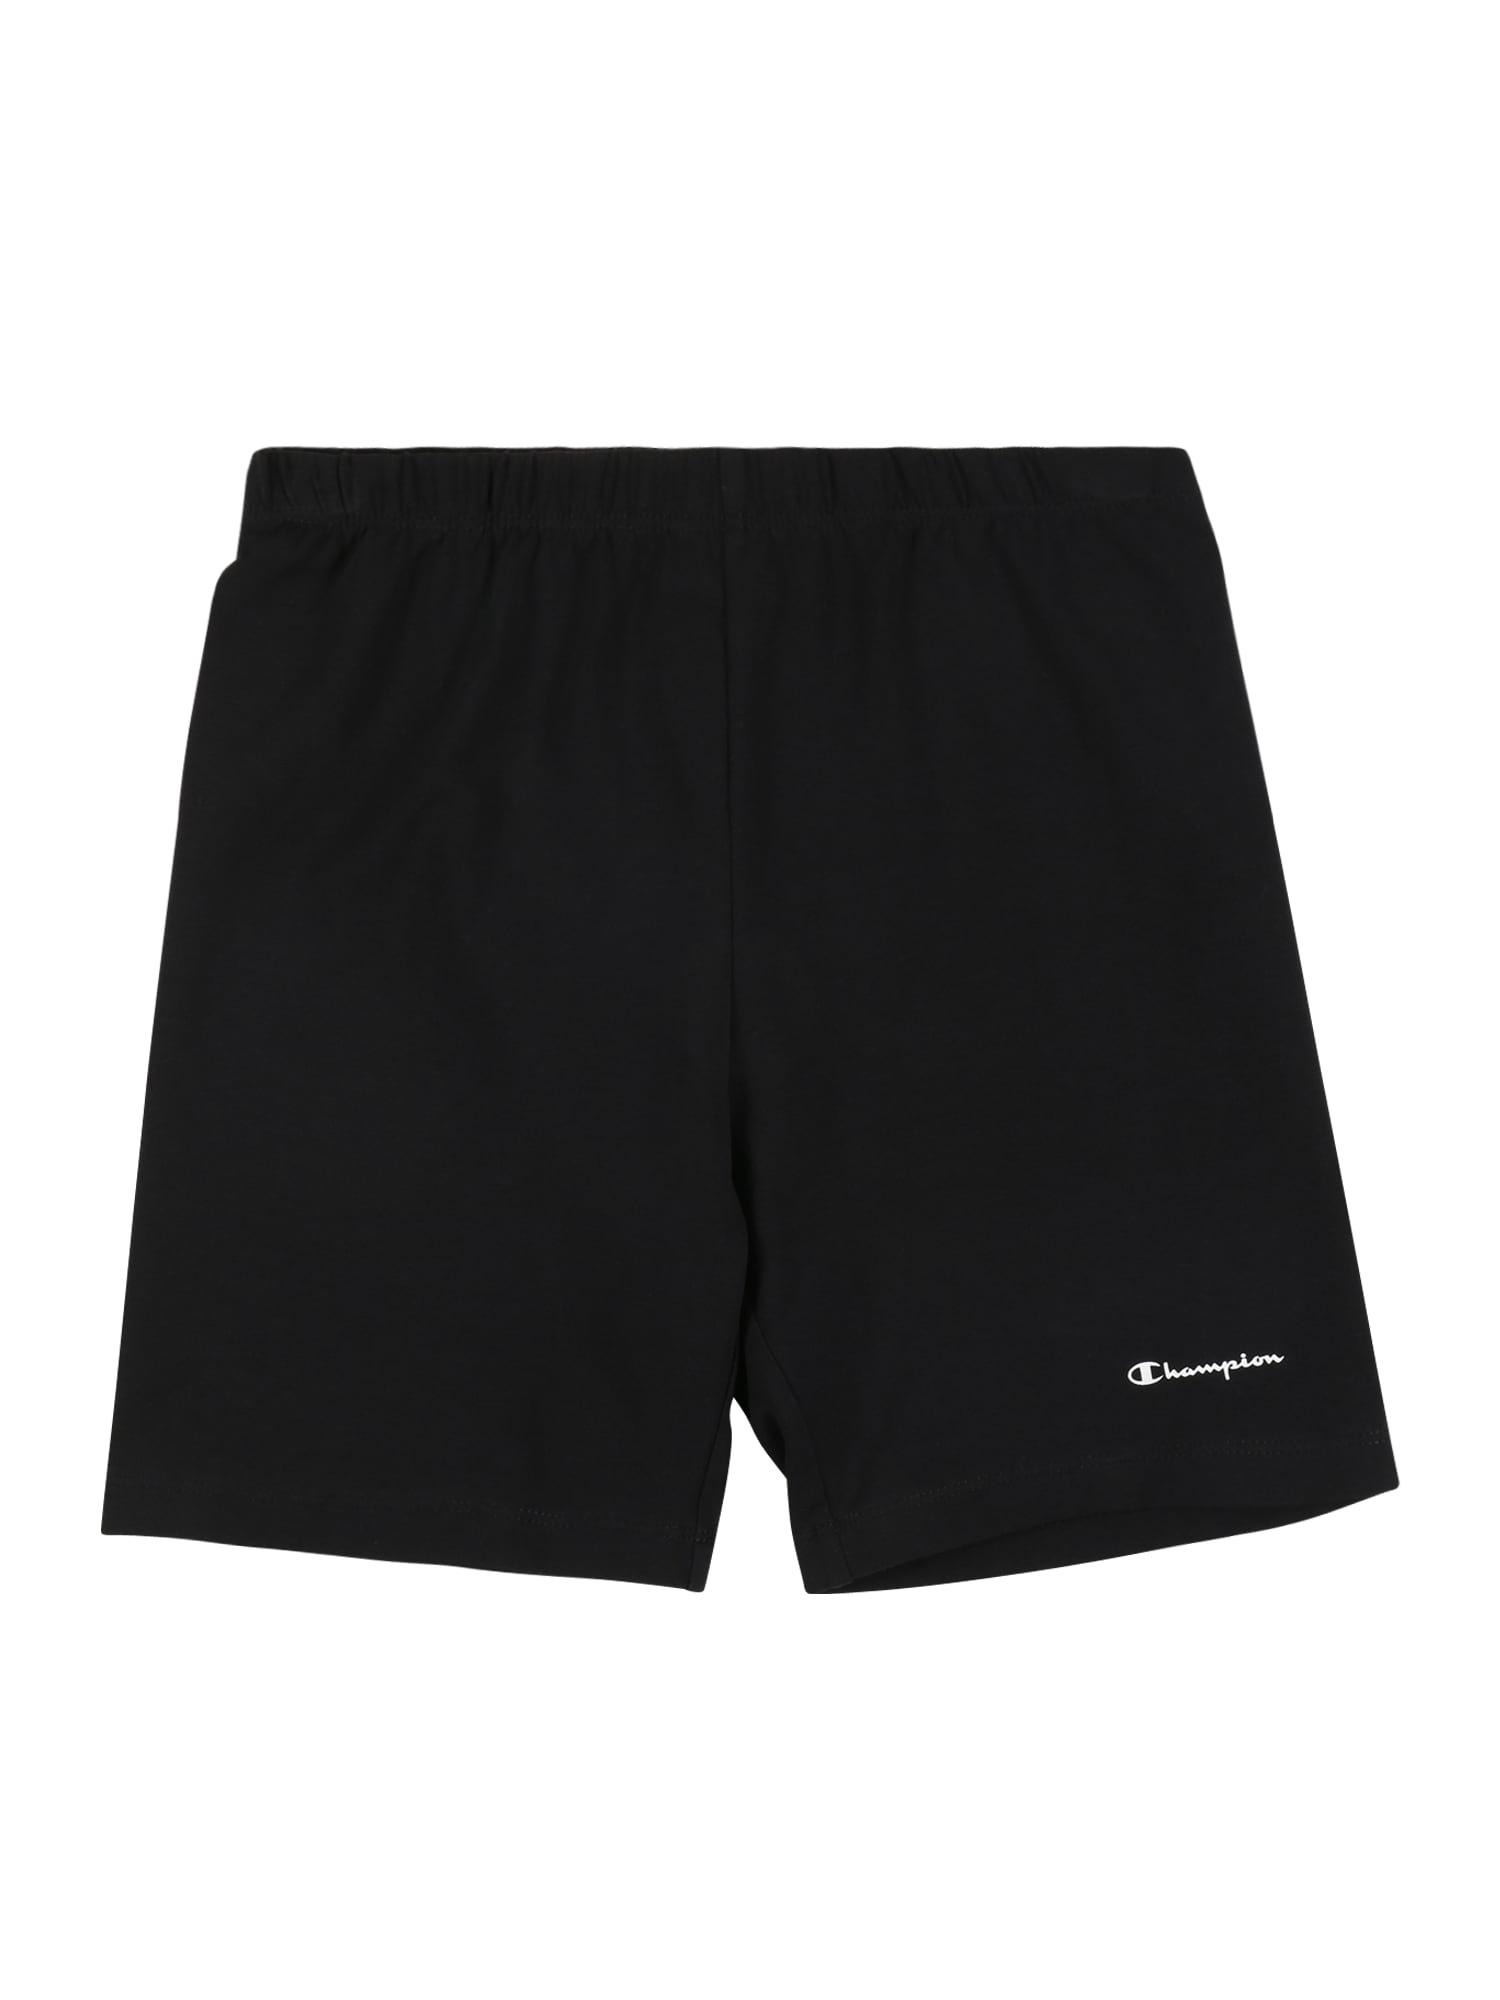 Champion Authentic Athletic Apparel Kelnės 'Fit Shorts' juoda